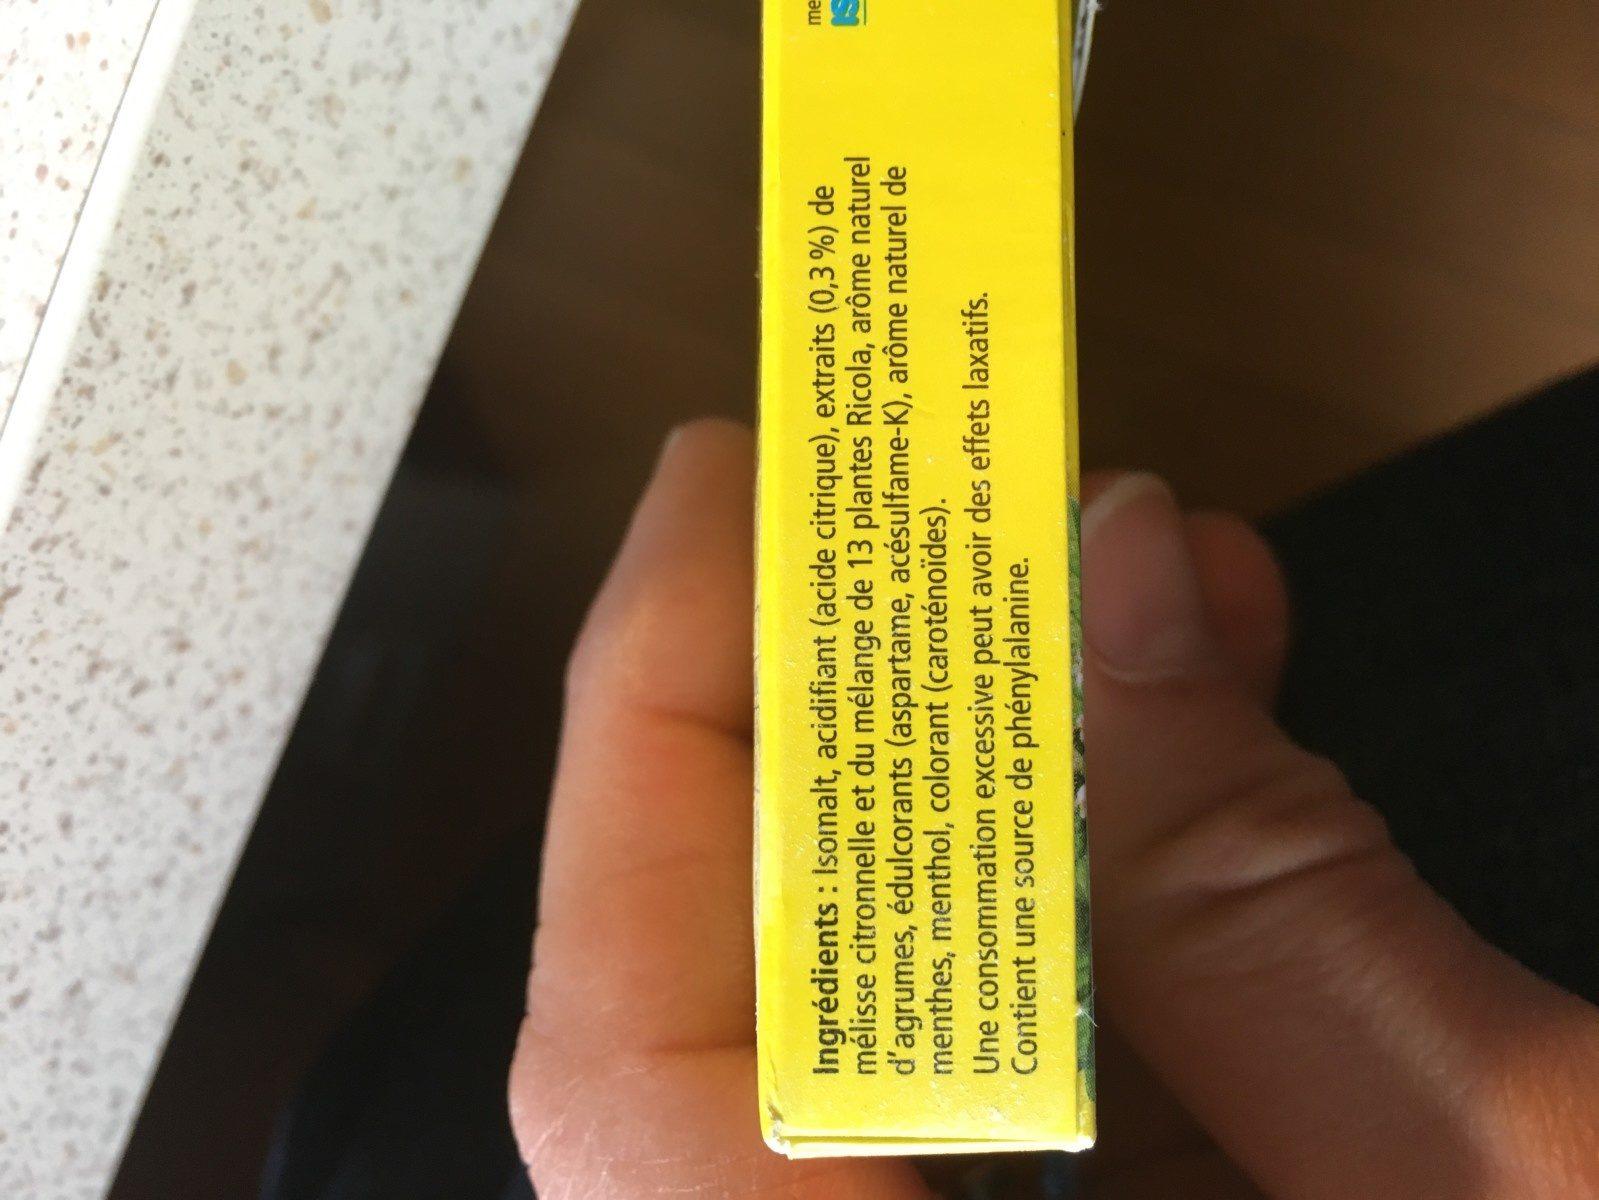 Lemon Mint - Ingredients - fr